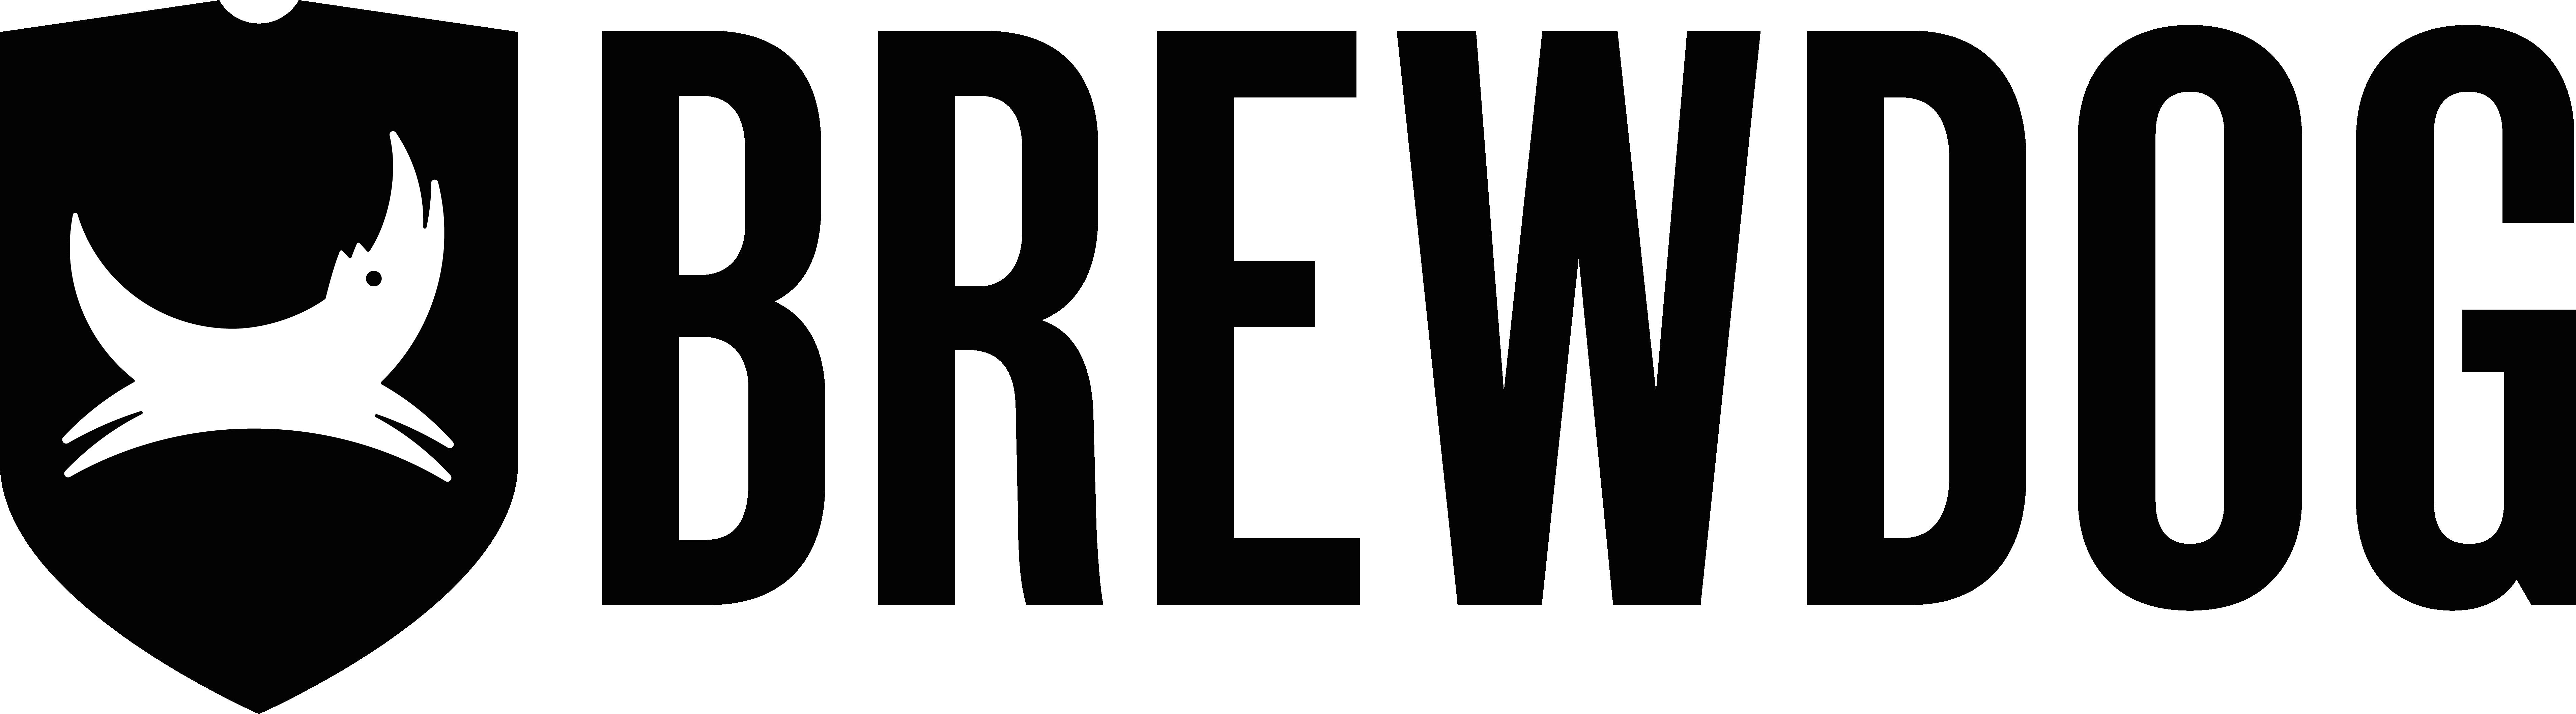 BrewDogLogo Wide Black Master - Brewdog : premier brasseur au monde neutre en carbone